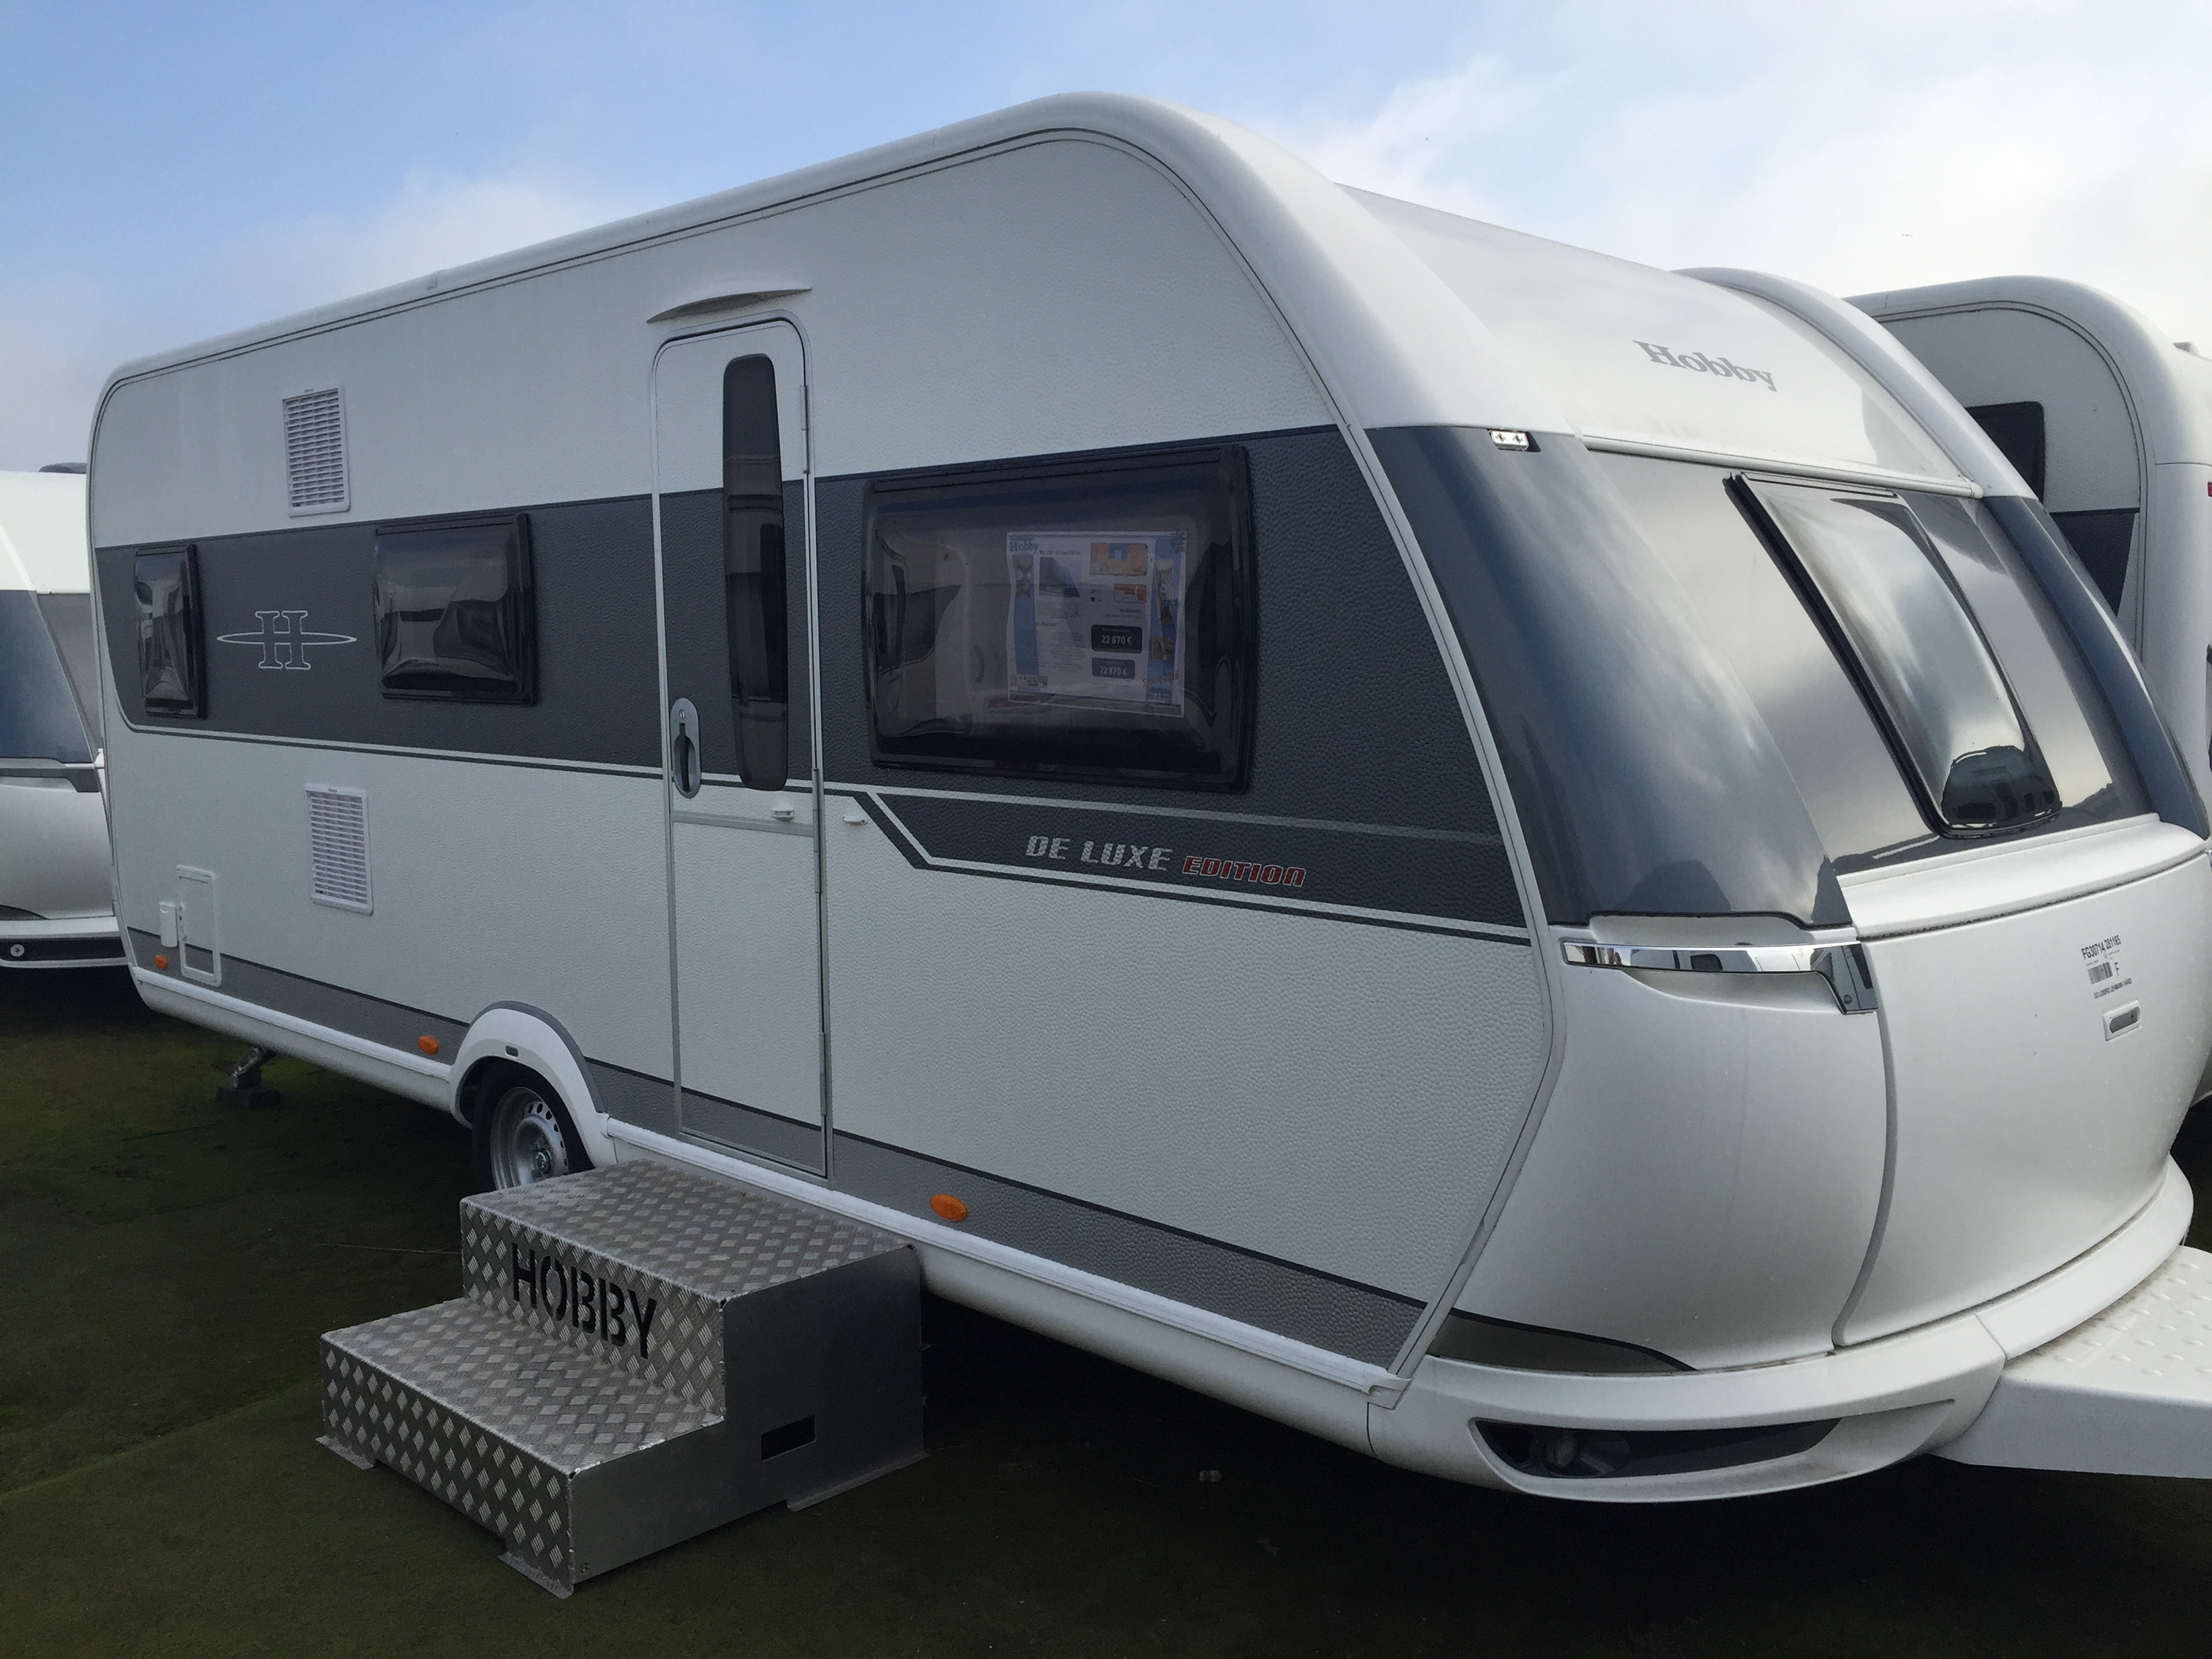 hobby 545 kmf de luxe edition neuf de 2017 caravane en vente oberschaeffolsheim rhin 67. Black Bedroom Furniture Sets. Home Design Ideas